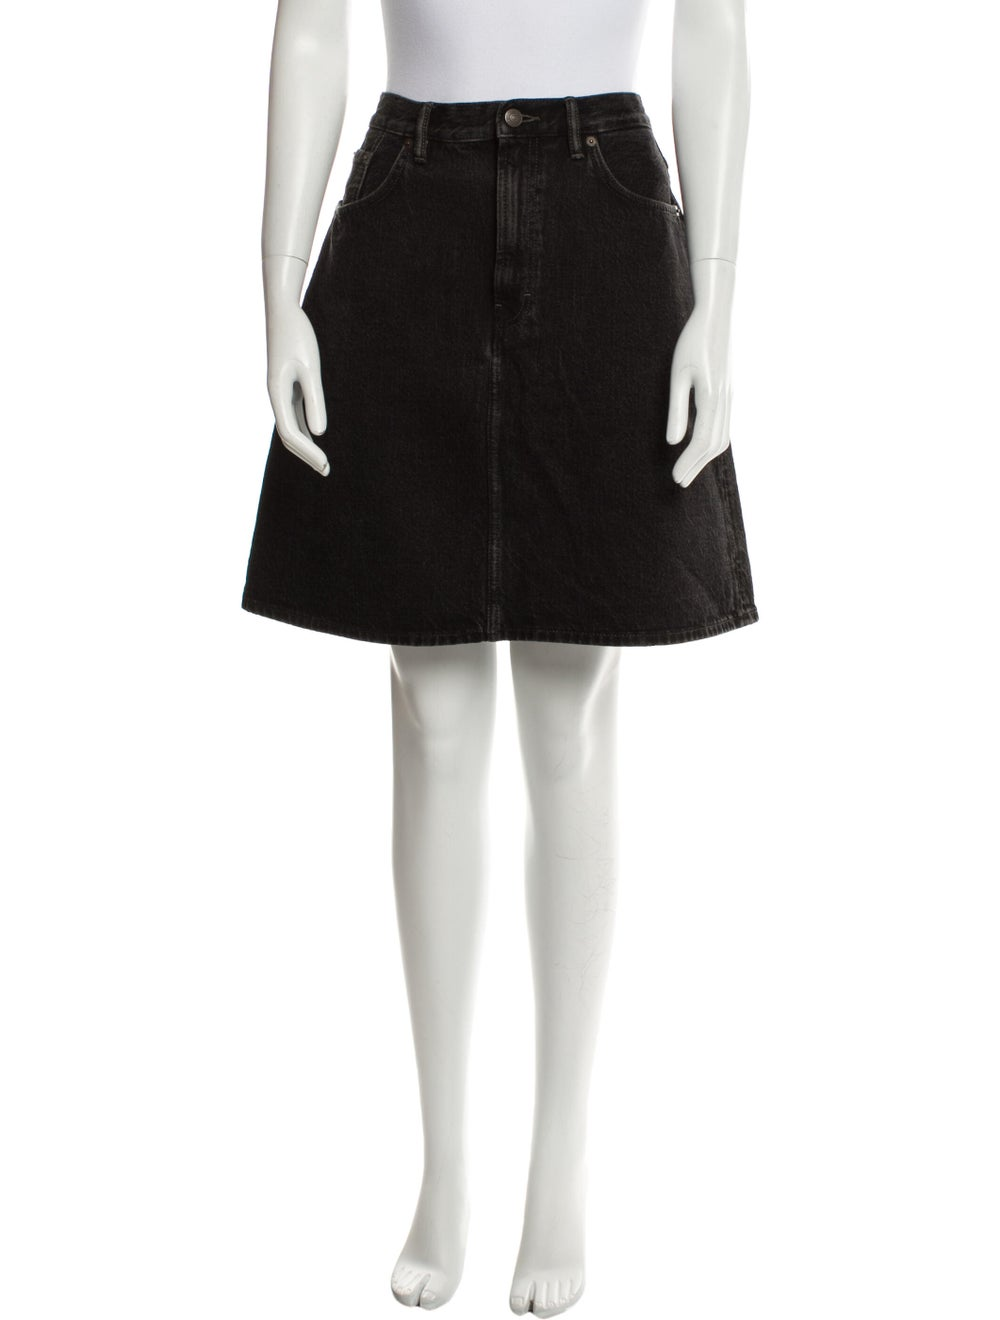 Acne Studios Mini Skirt Black - image 1